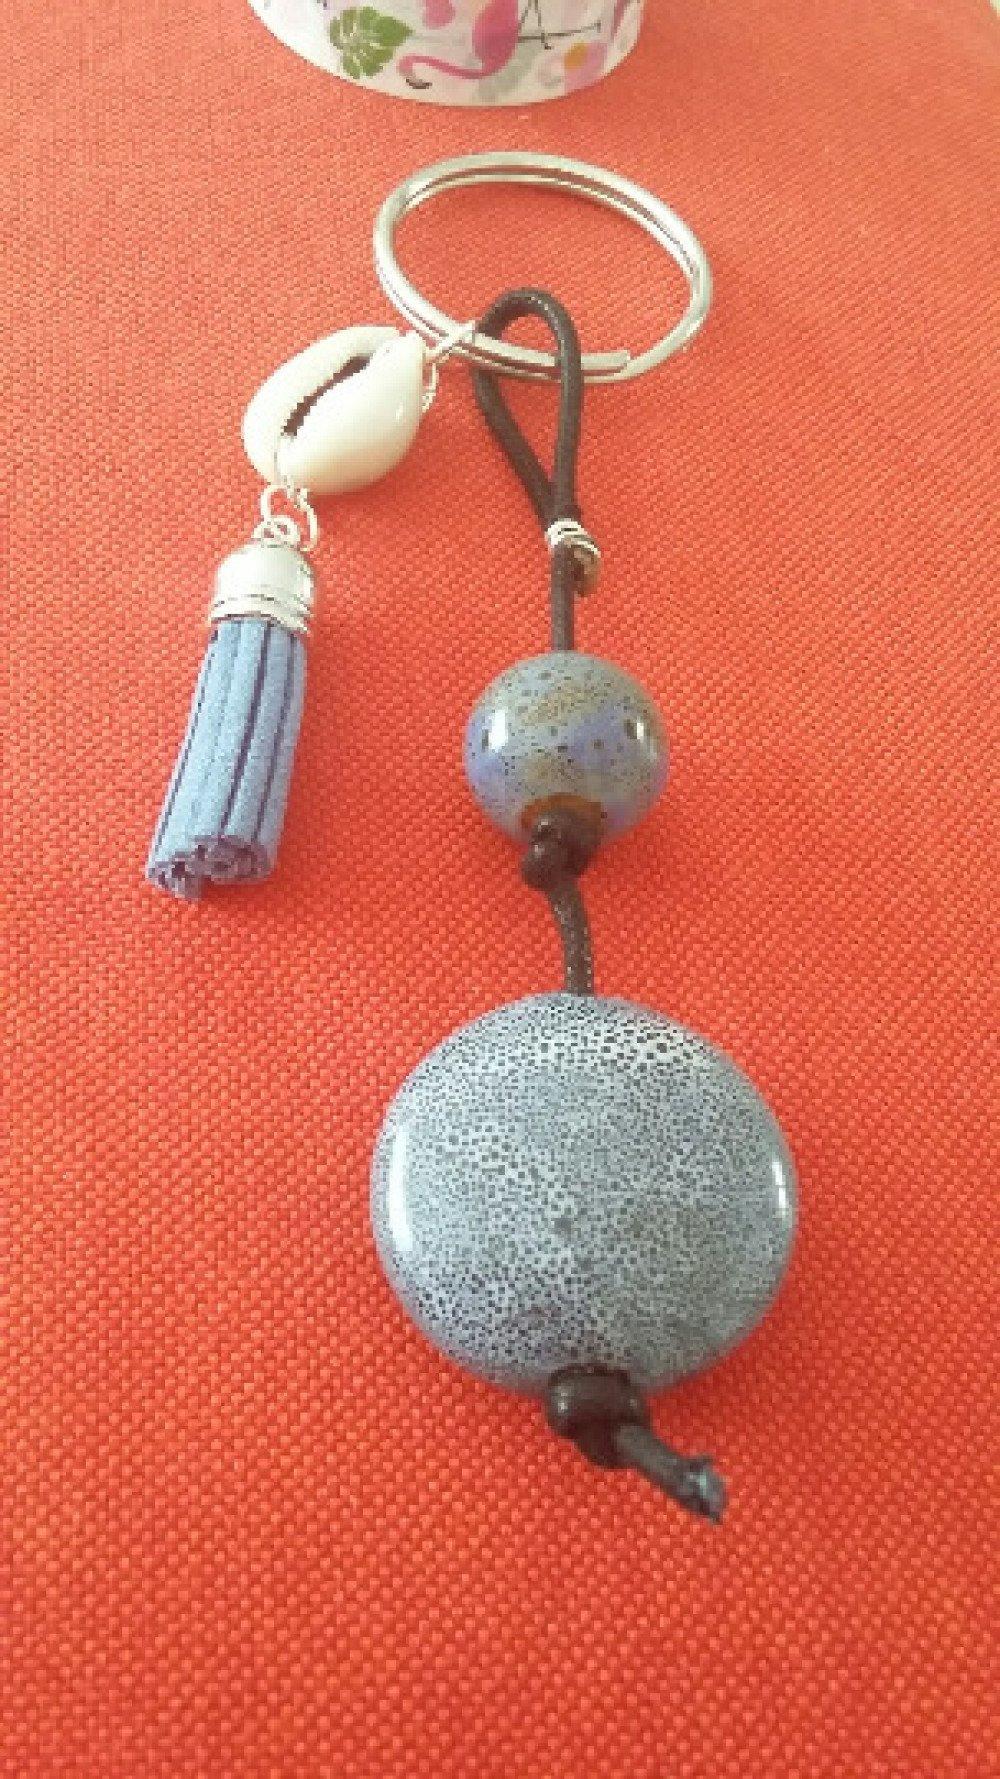 Porte-clé ou bijou de sac - pompons, perles et coquillage